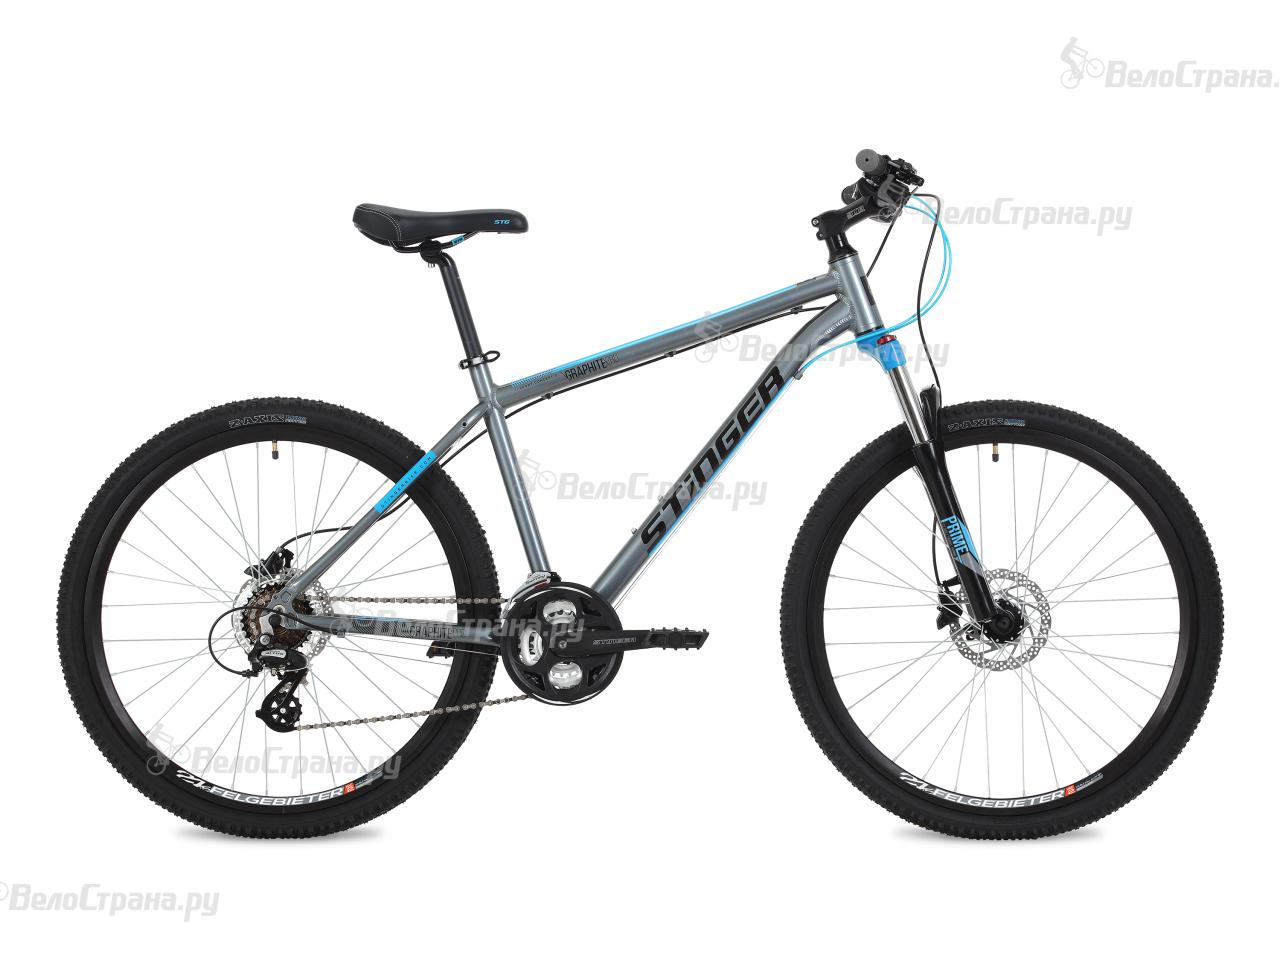 Велосипед Stinger Graphite Pro 27,5 (2018) кий пирамида 2 pc rus pro 2008 rp8 5 черный cuetec 26 109 62 5